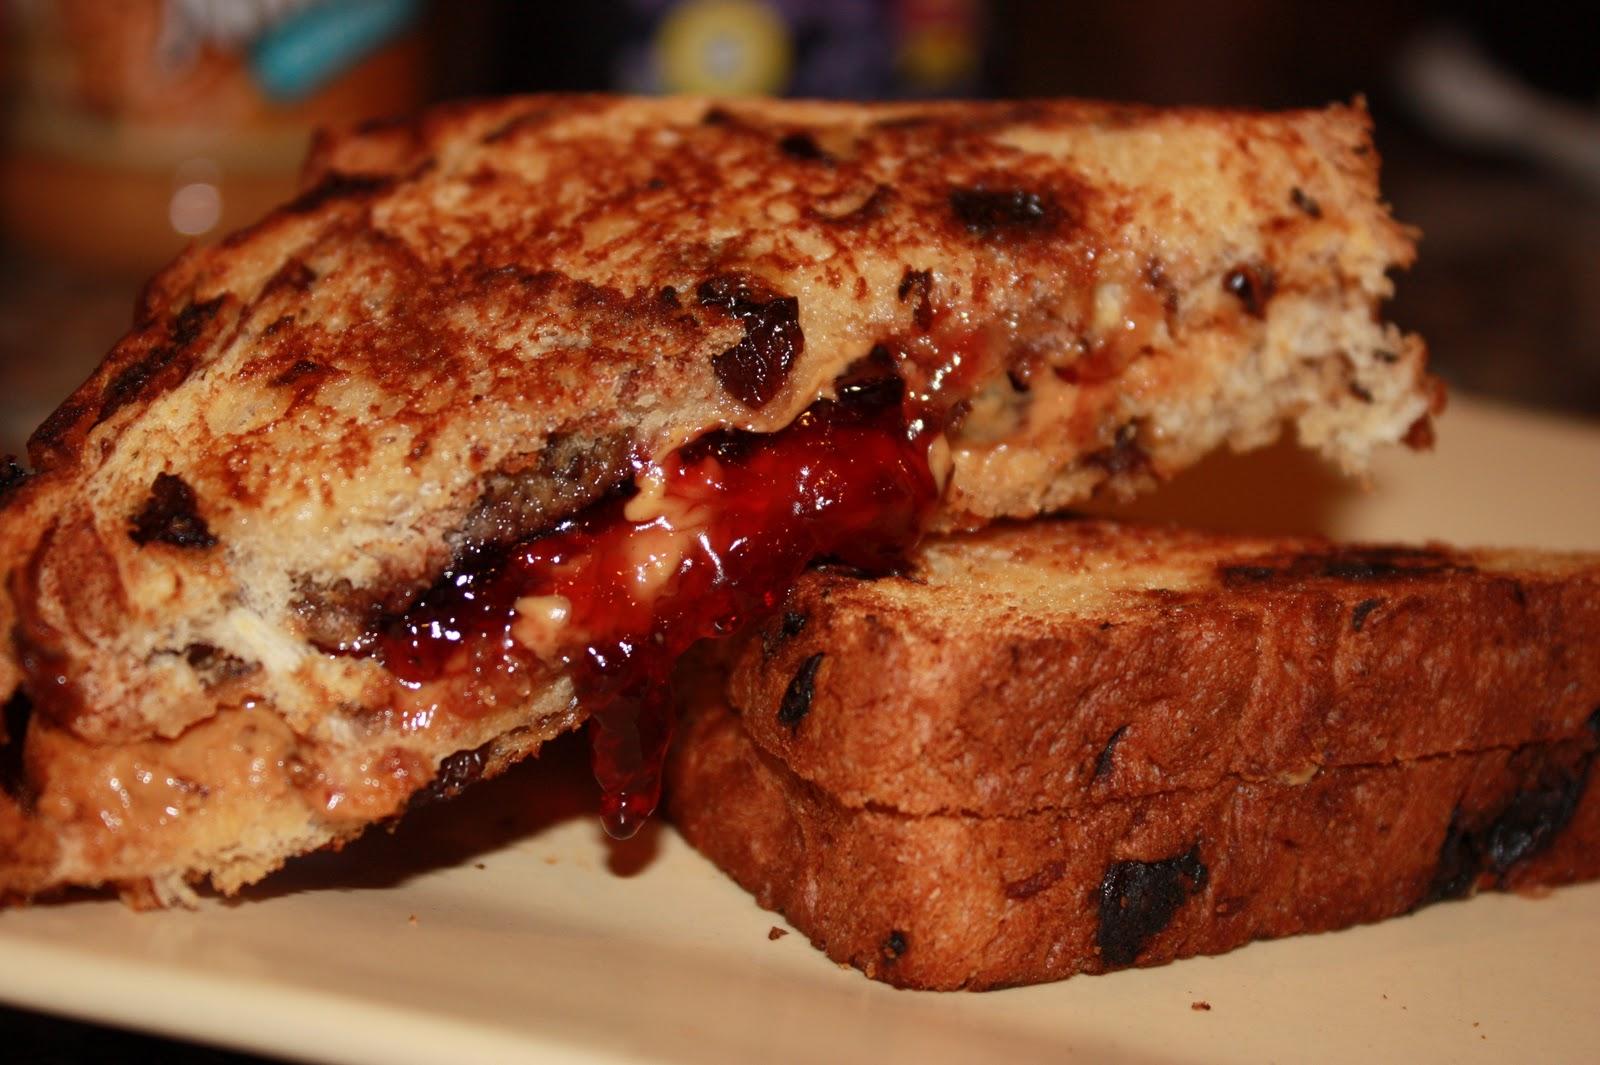 Bellabits: Grilled Peanut Butter & Jelly on Raisin Bread